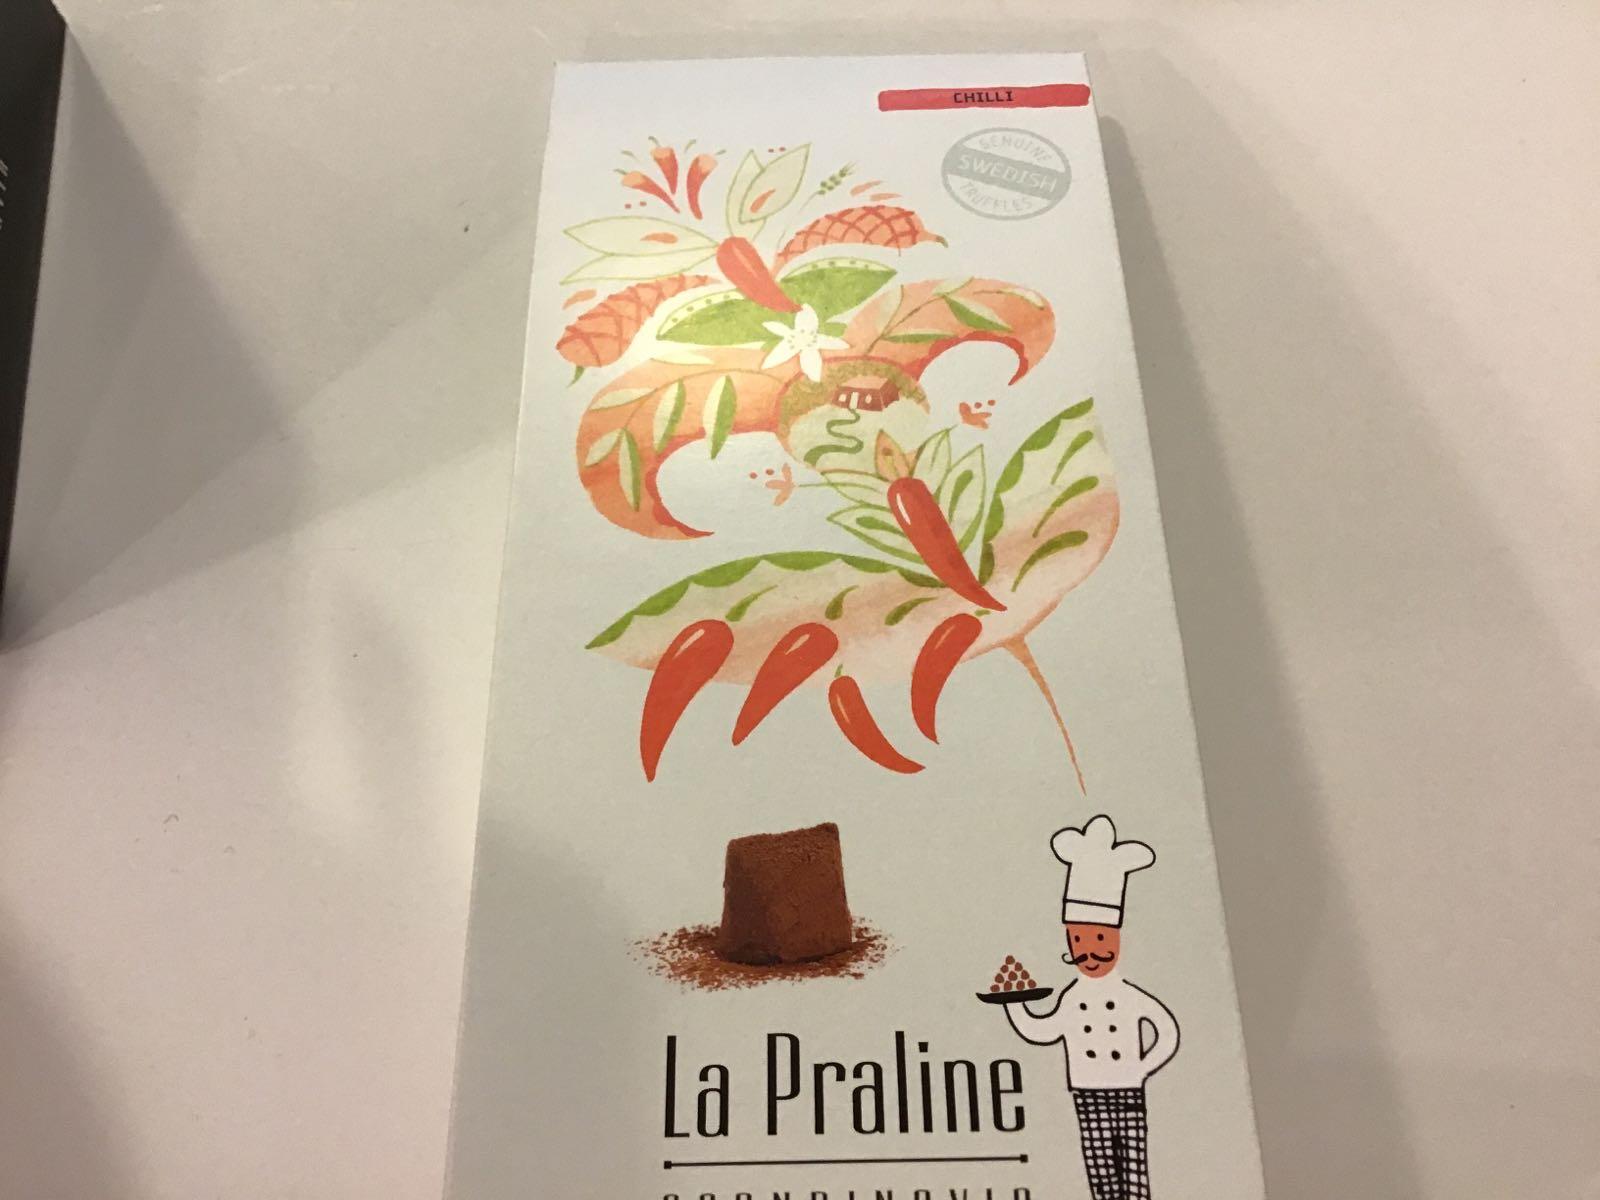 LA PRALINE chili